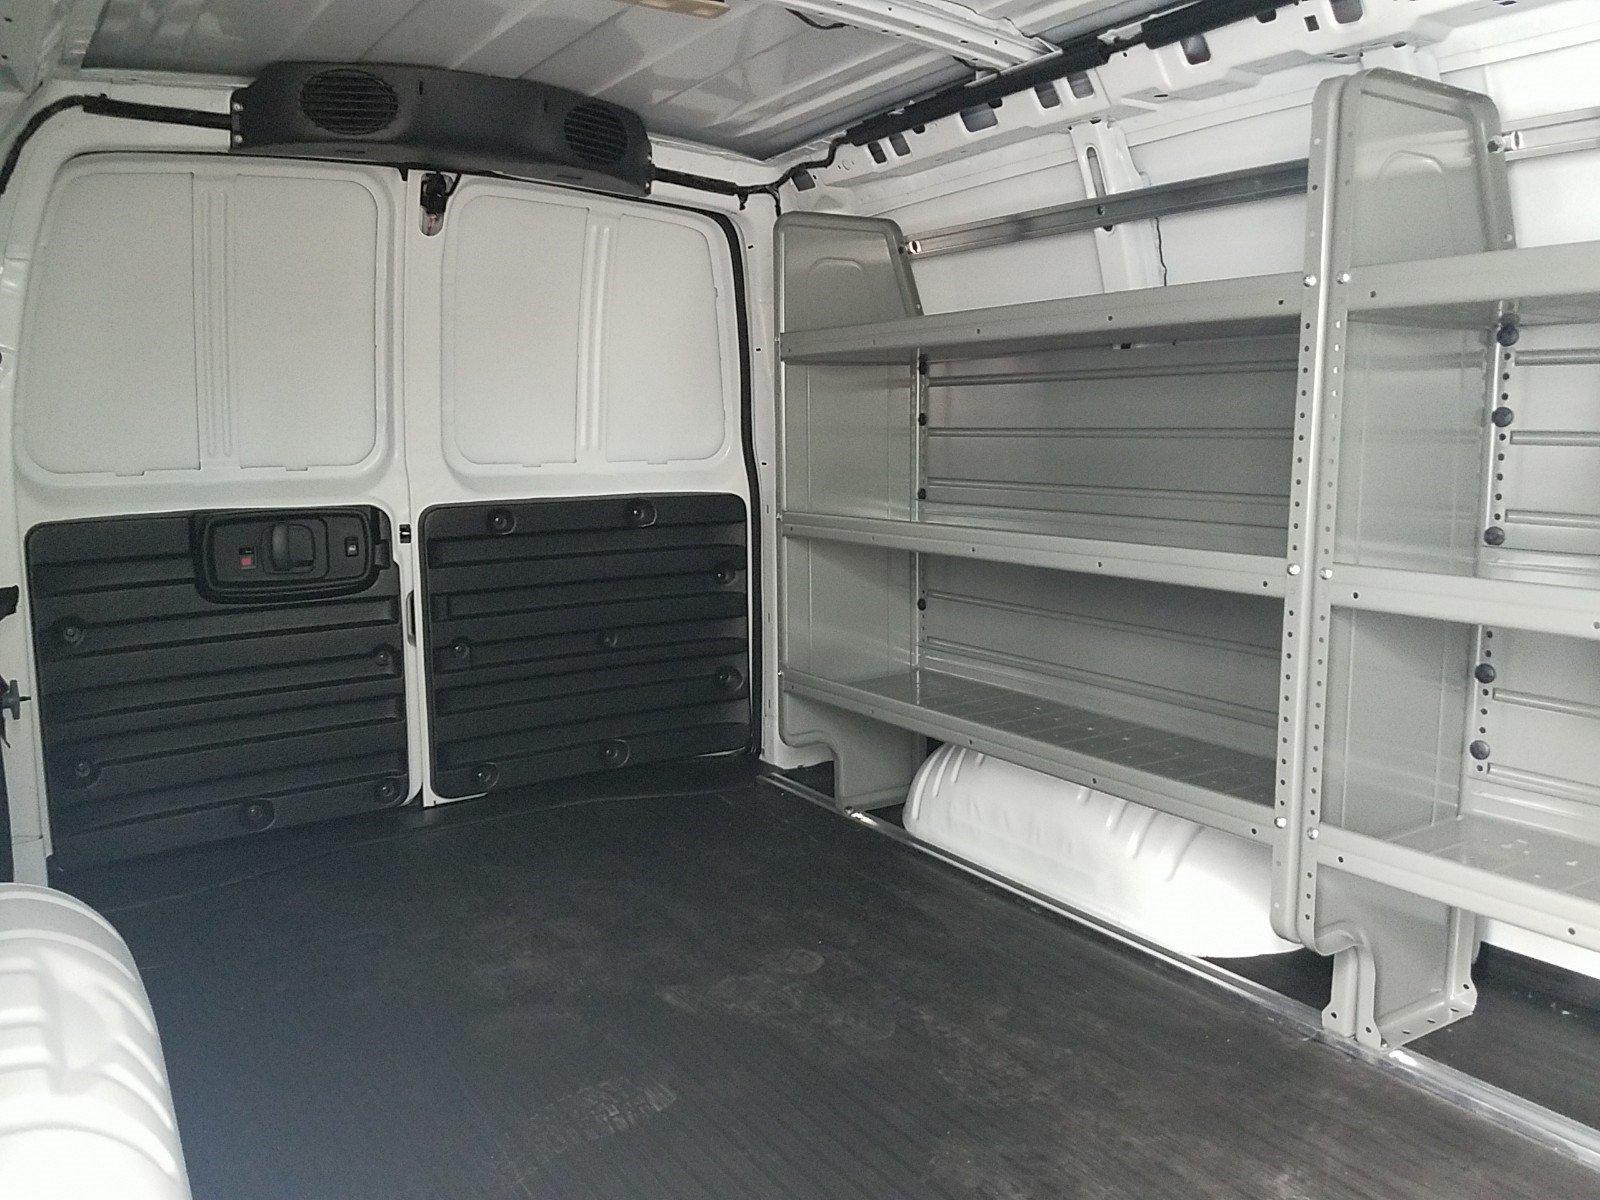 2019 Express 2500 4x2,  Adrian Steel Upfitted Cargo Van #K1260652 - photo 1